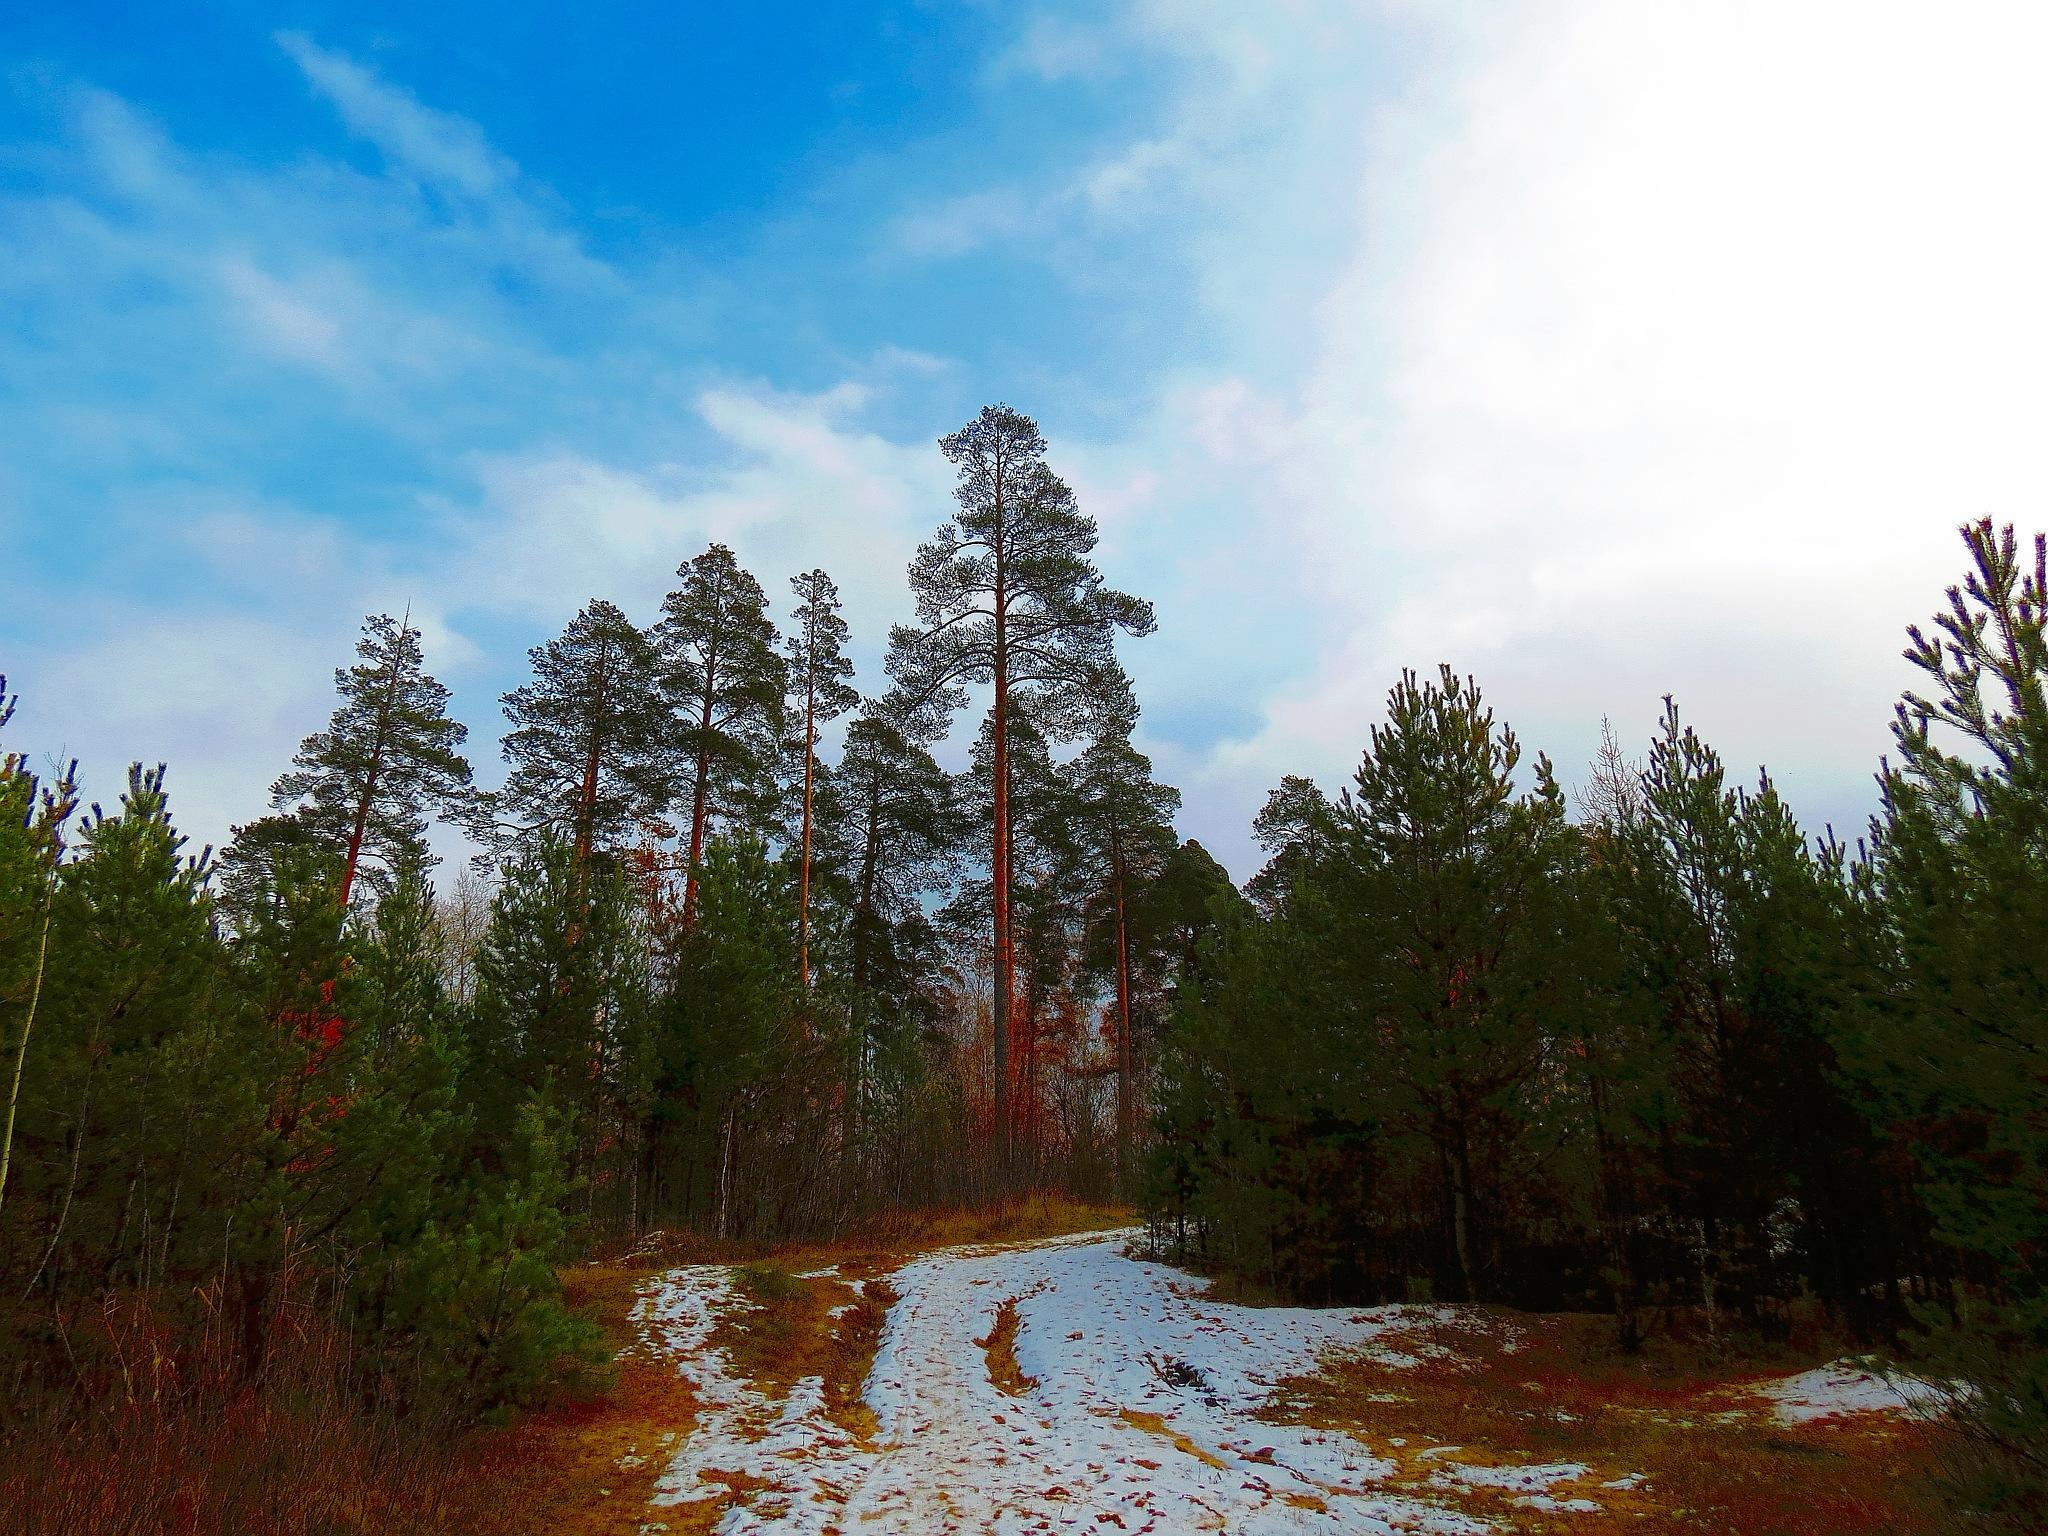 Pines Giants by sergey.parfeniuk